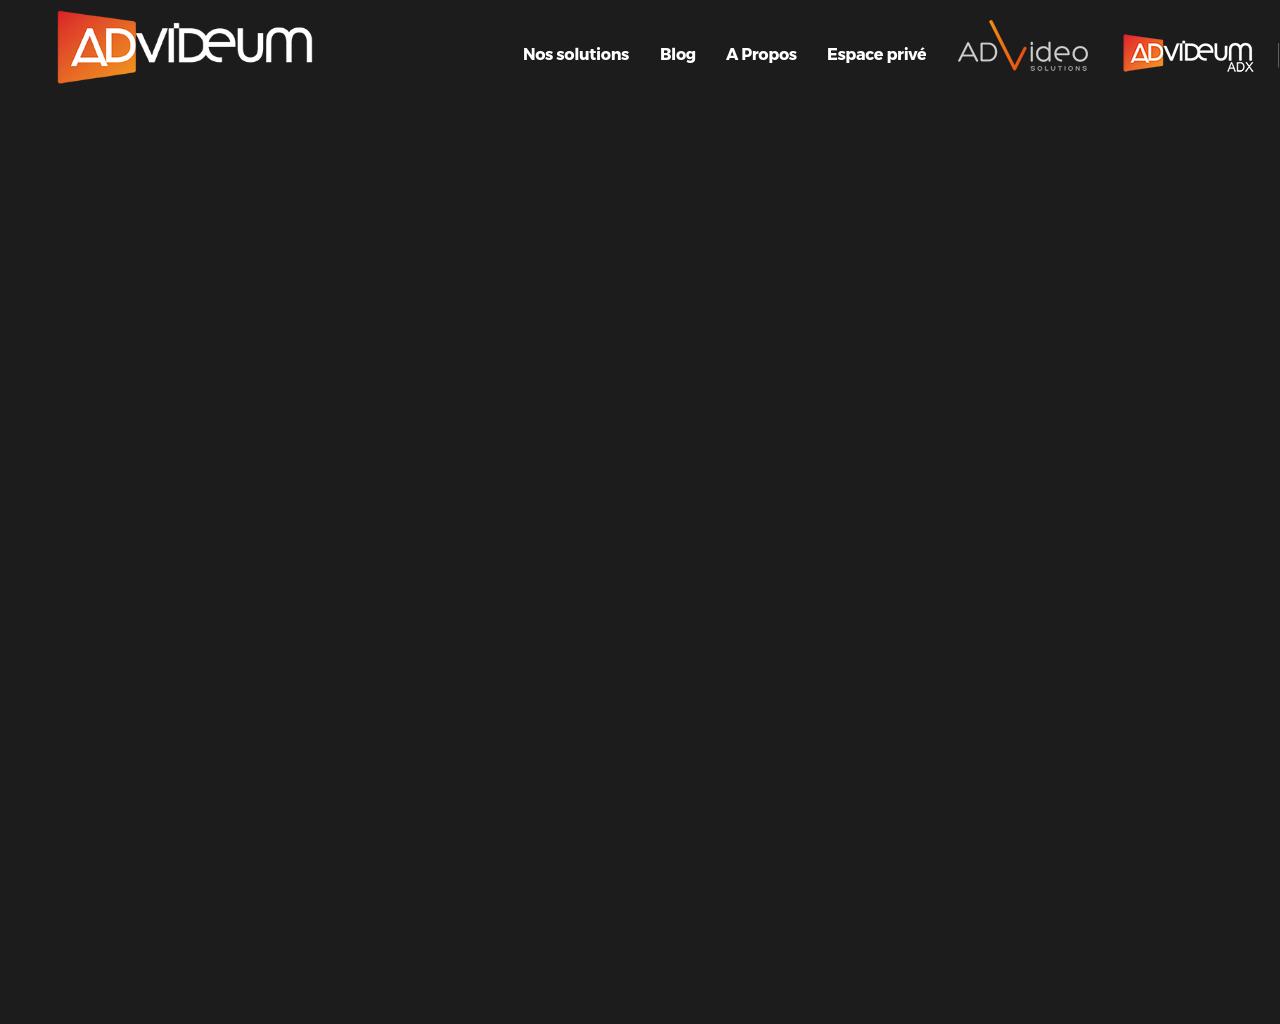 Advideum-Advertising-Reviews-Pricing